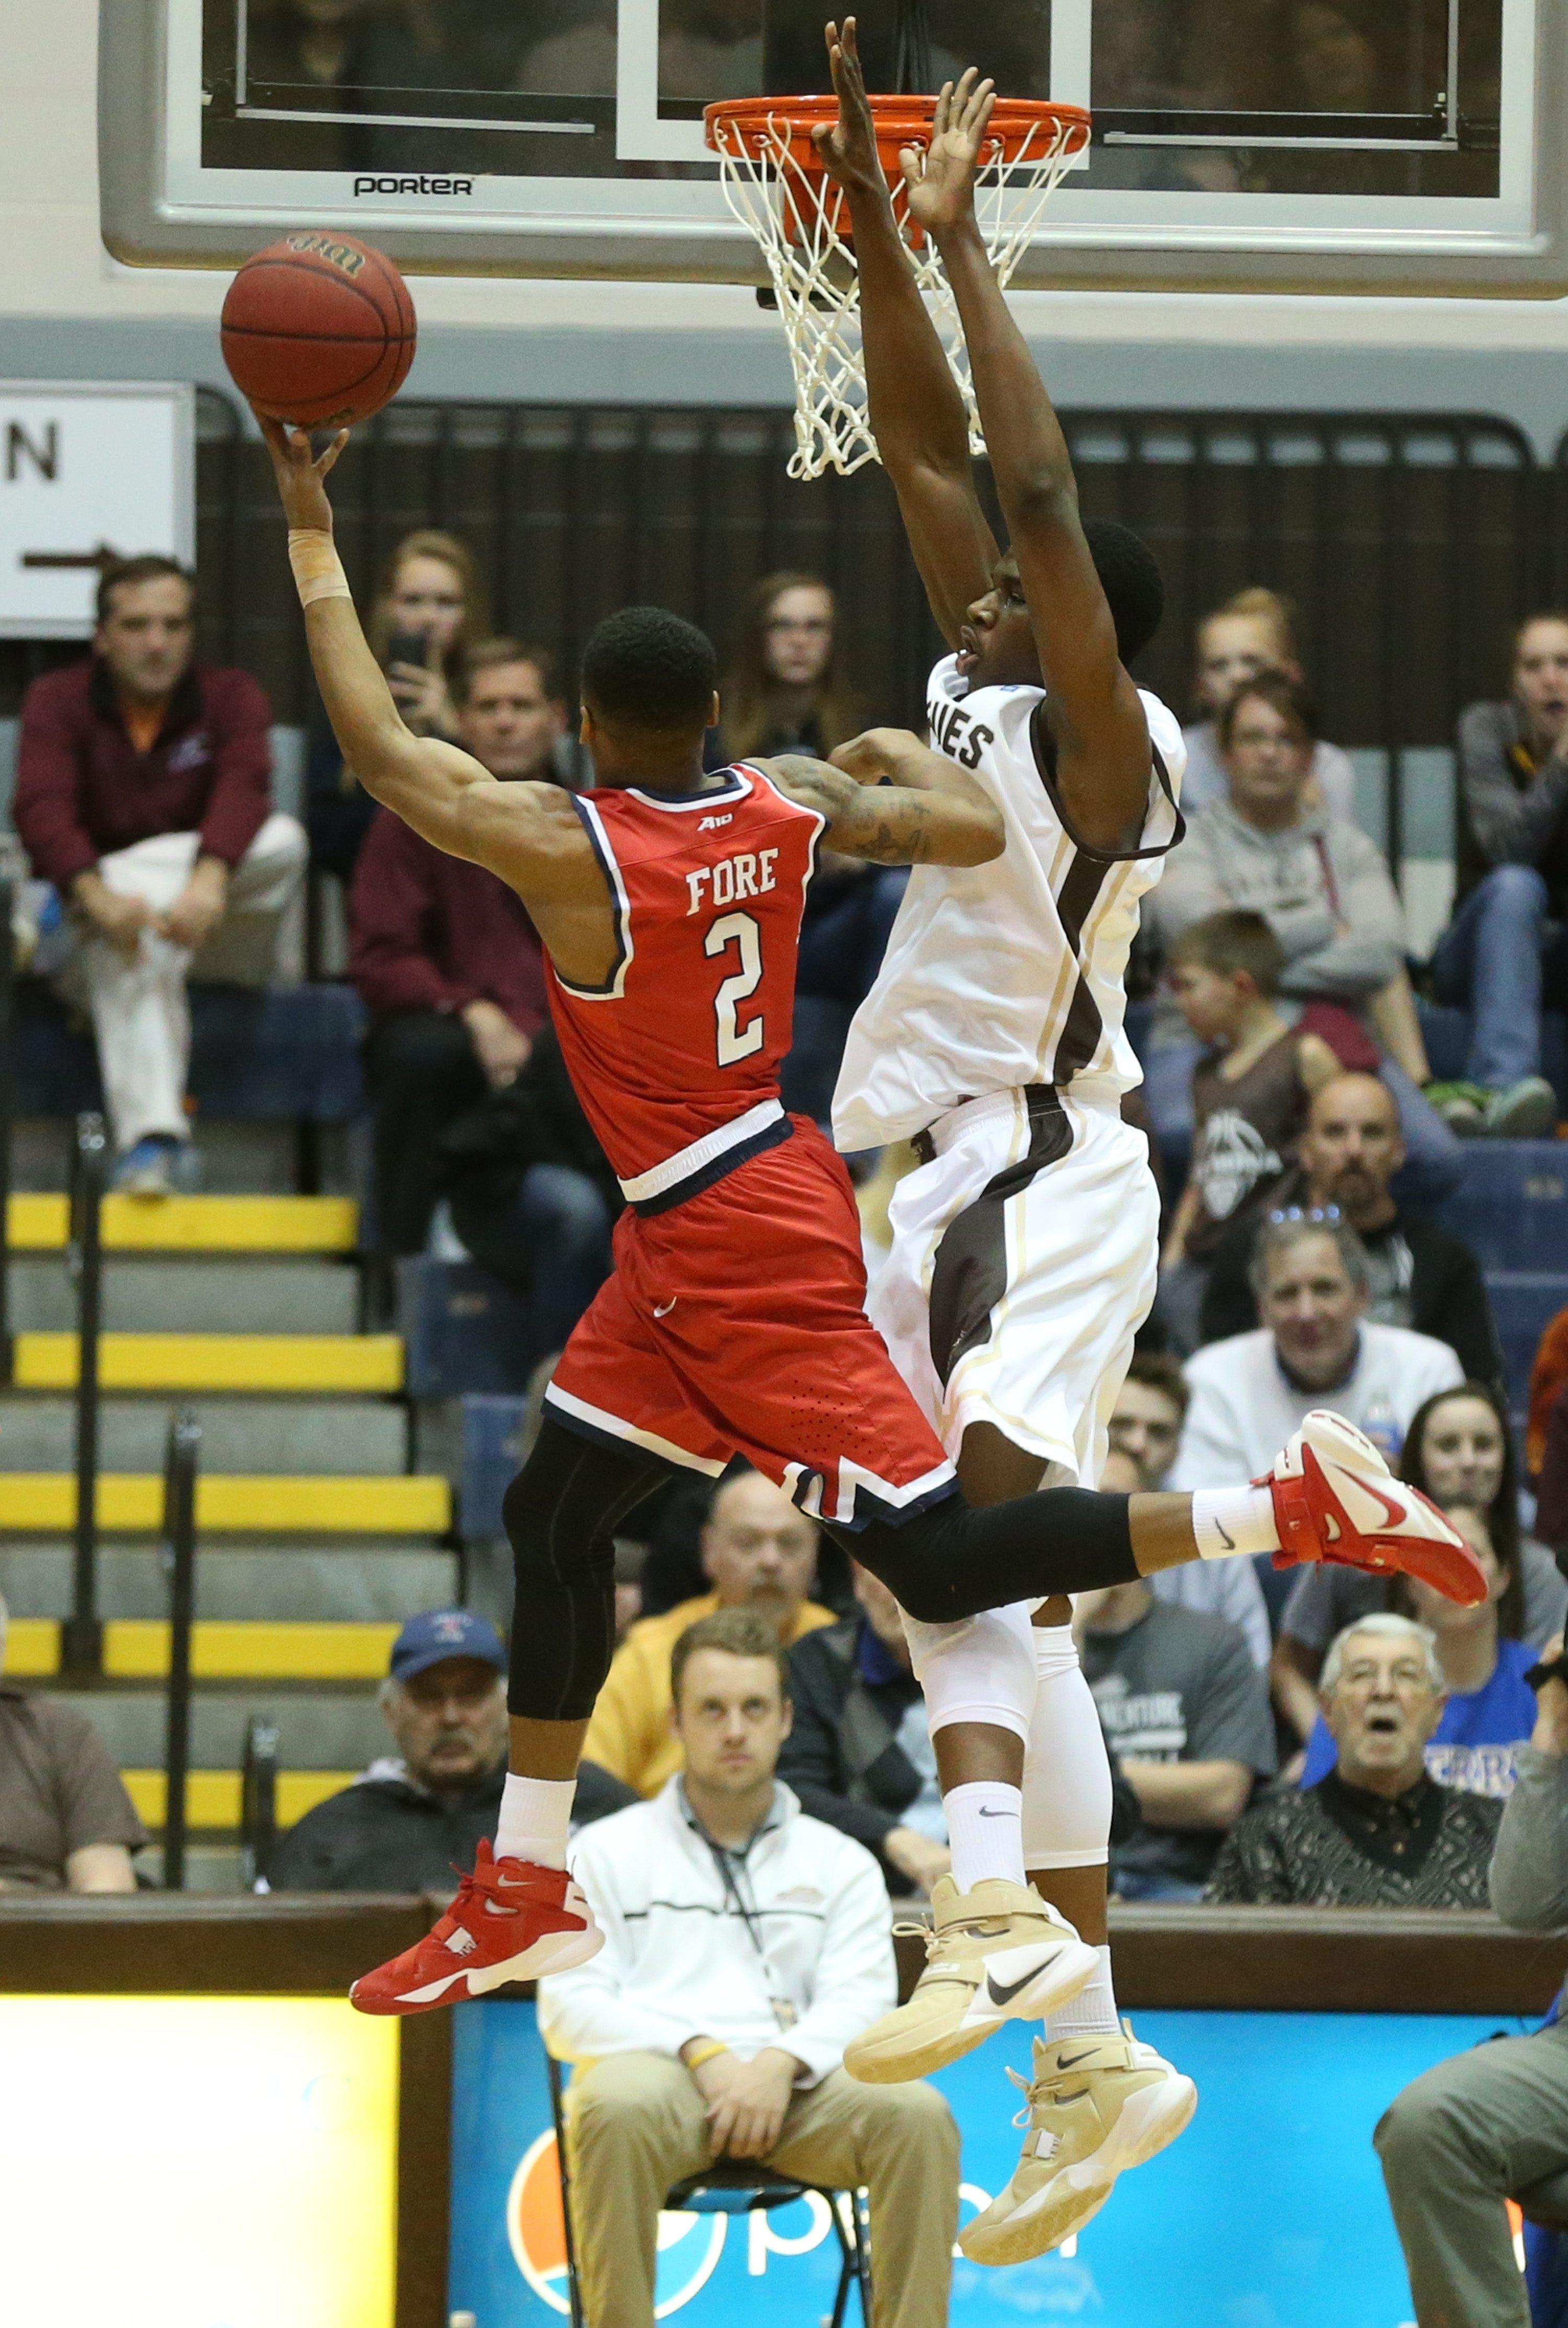 Forward Jordan Tyson is giving St. Bonaventure a big lift on the defensive end of the floor. (James P. McCoy/Buffalo News)